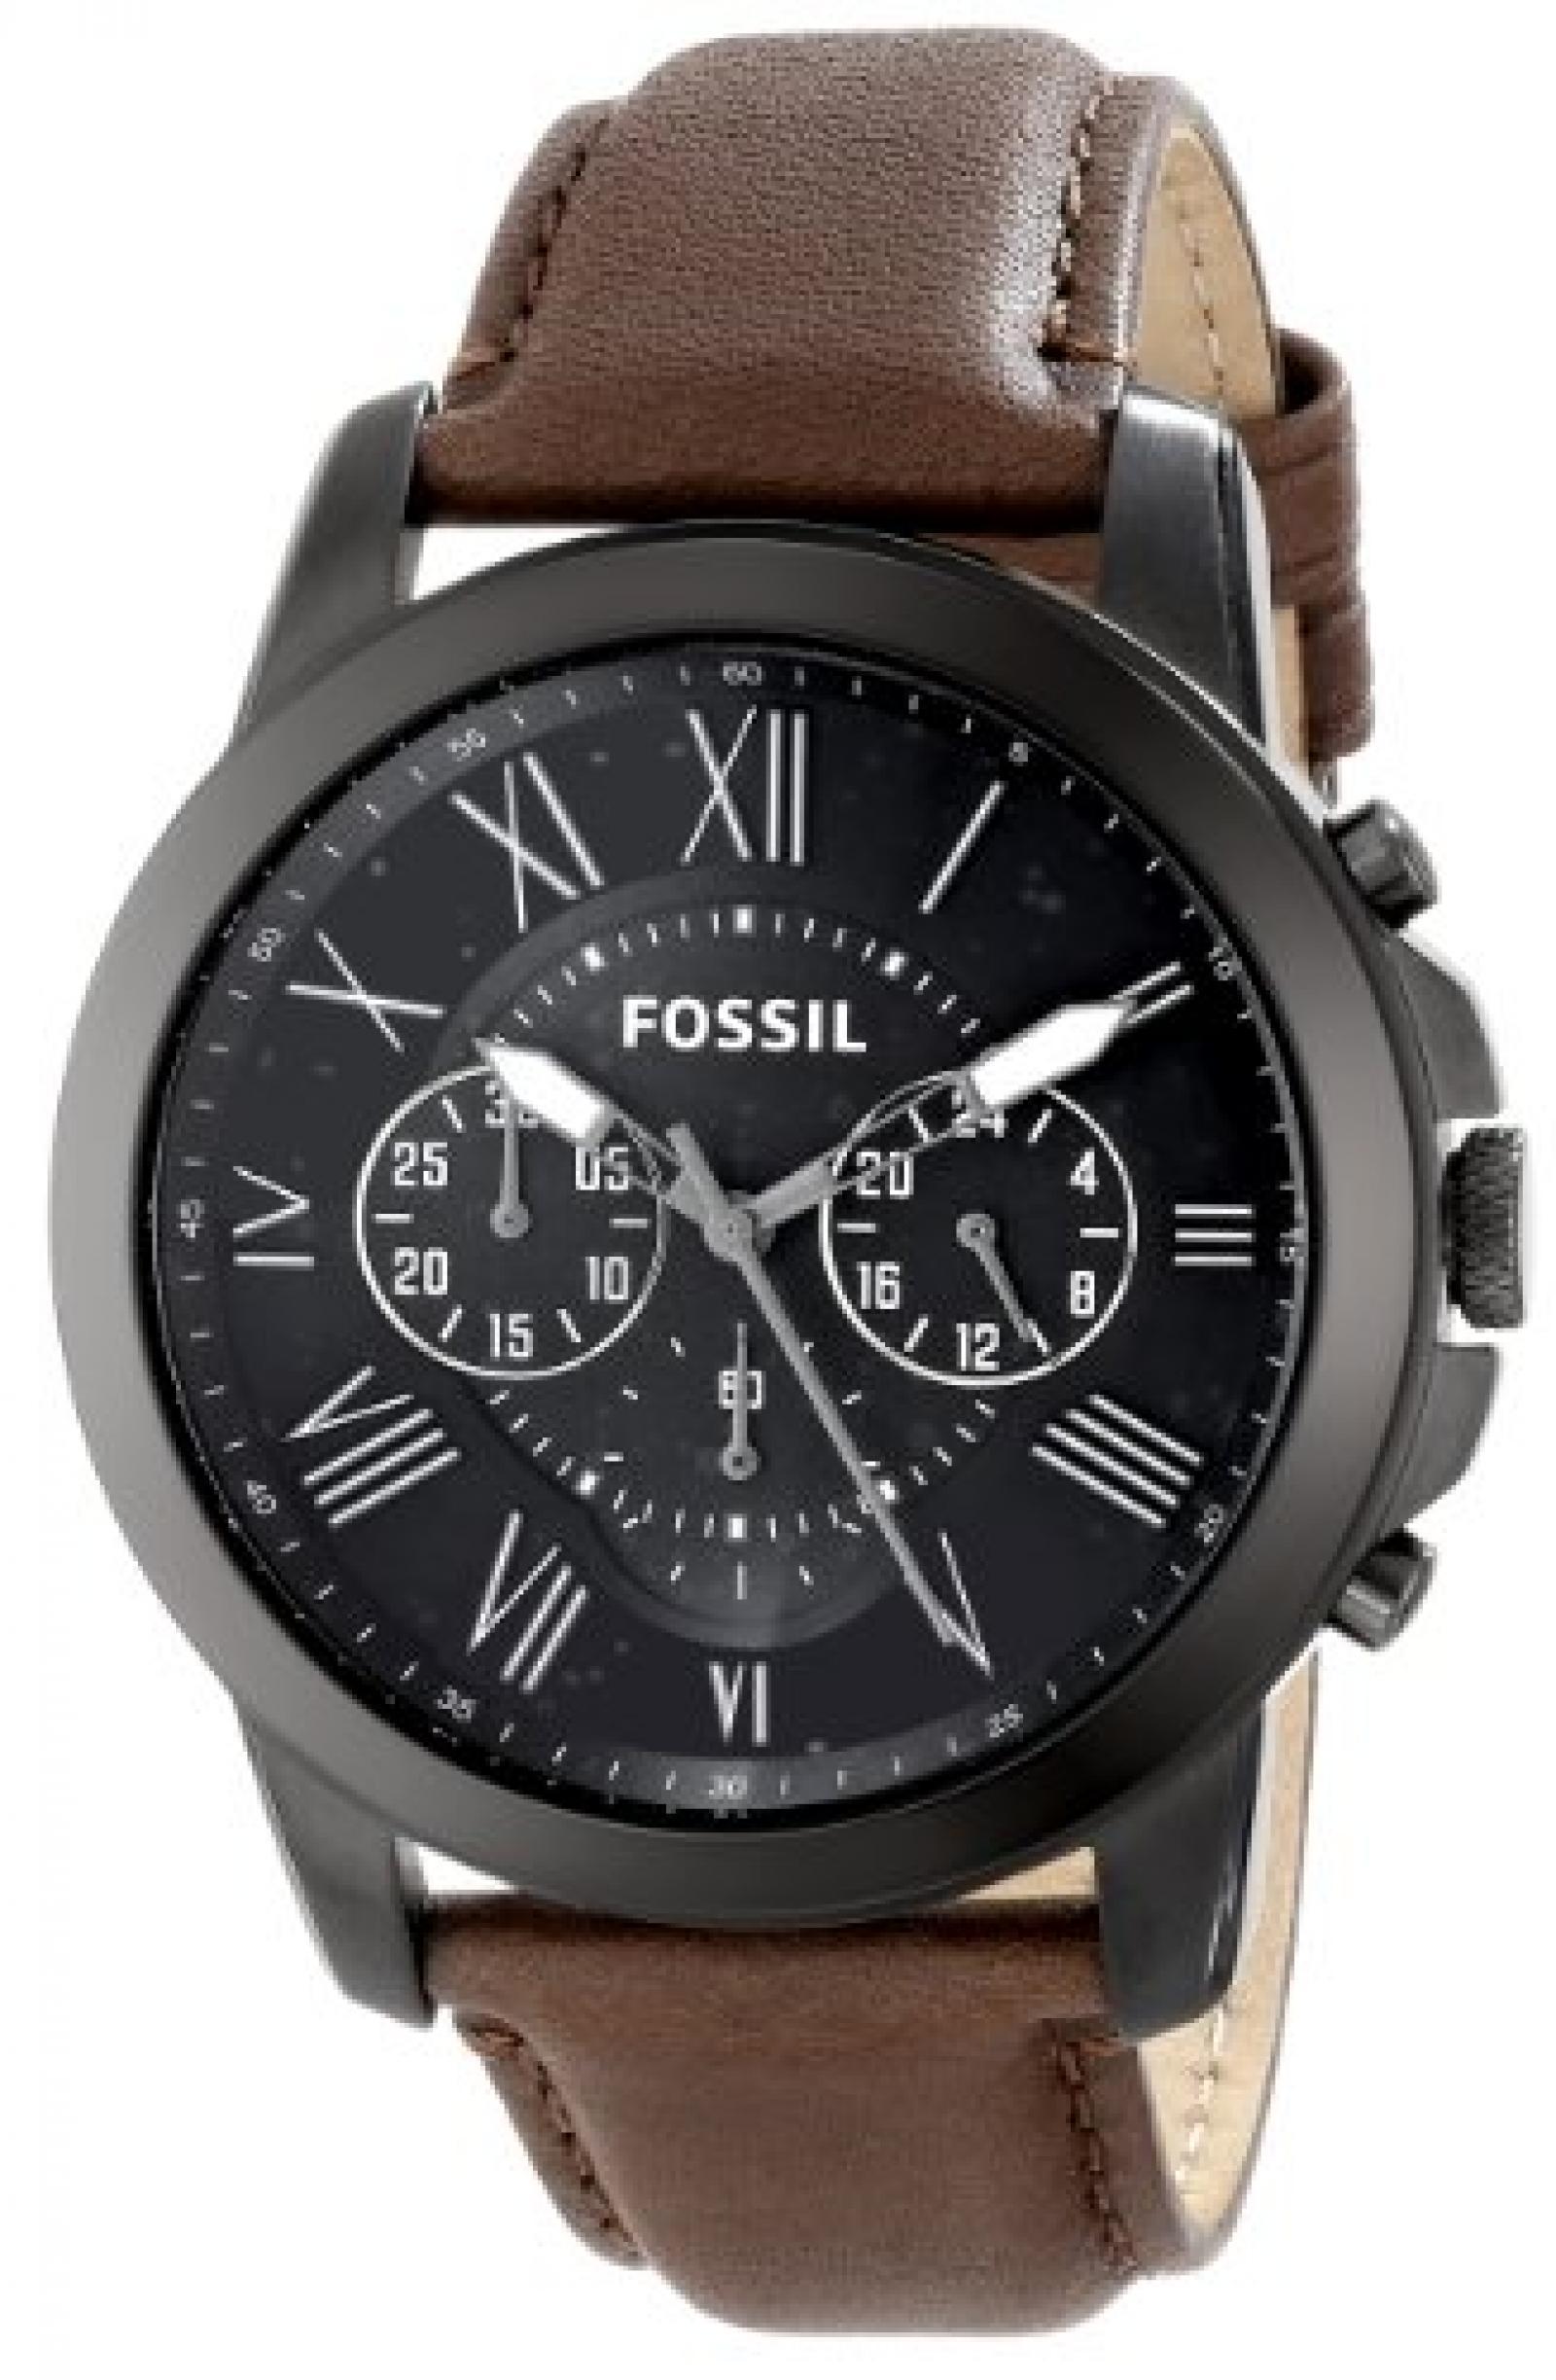 Fossil Herren-Armbanduhr XL Chronograph Quarz Leder FS4885